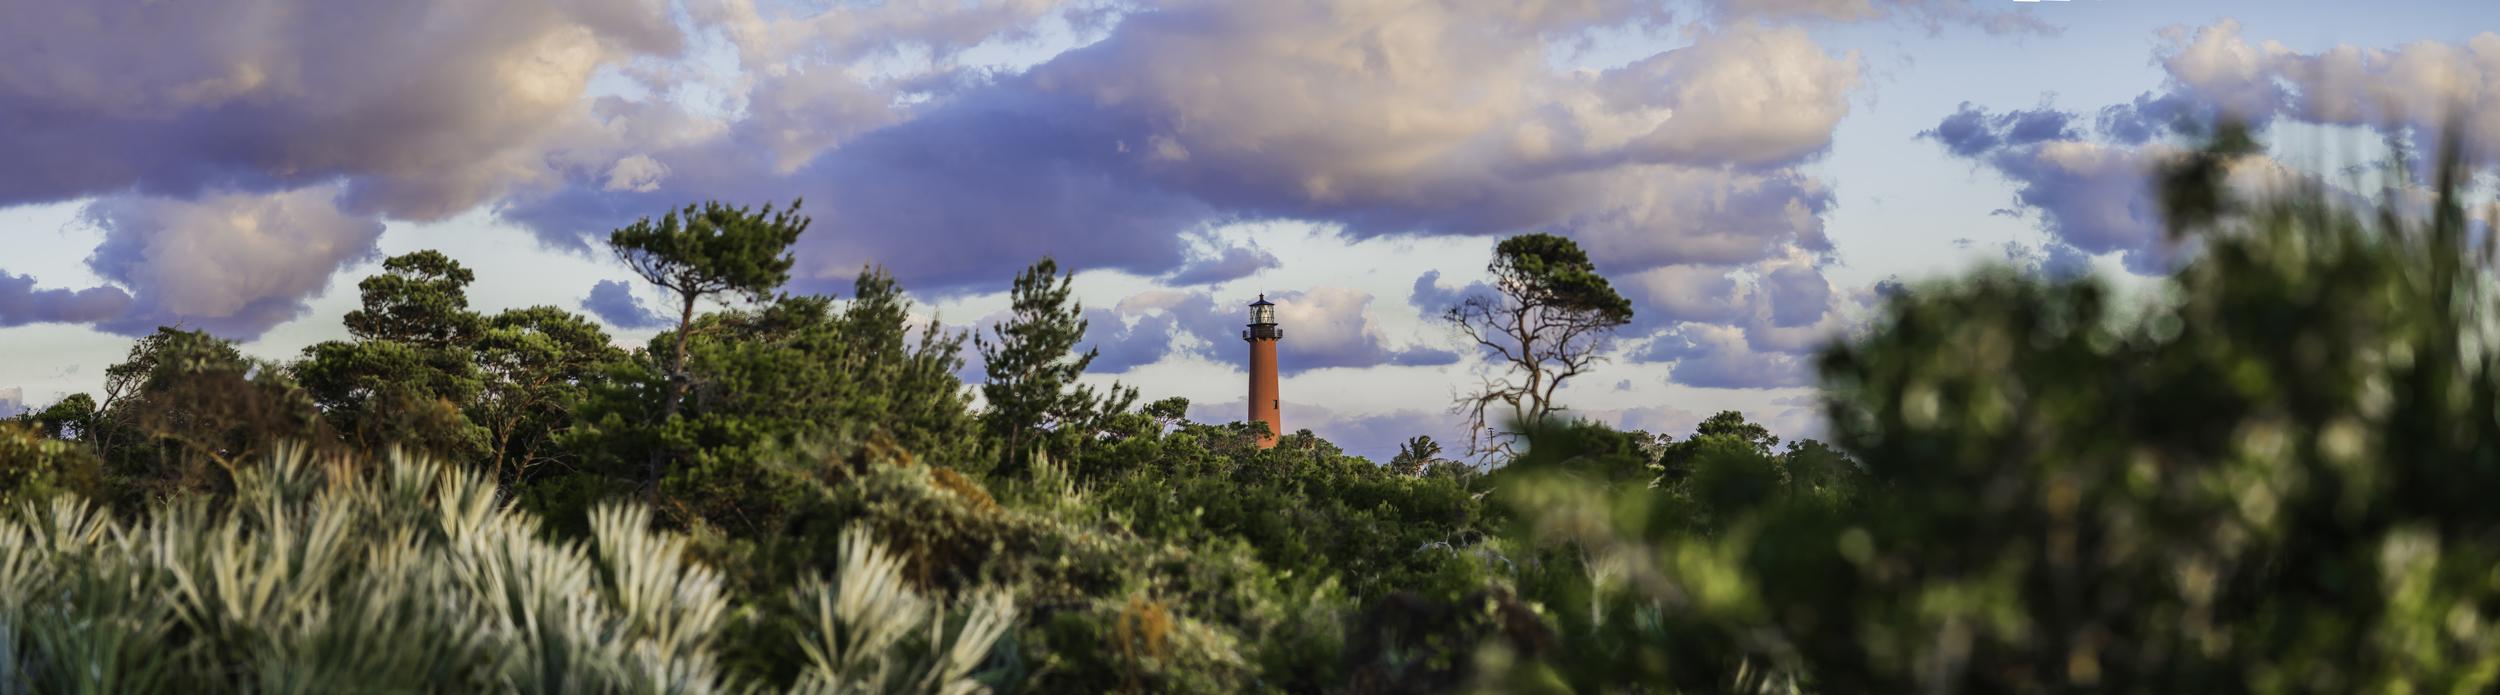 Lighthouse-46.jpg